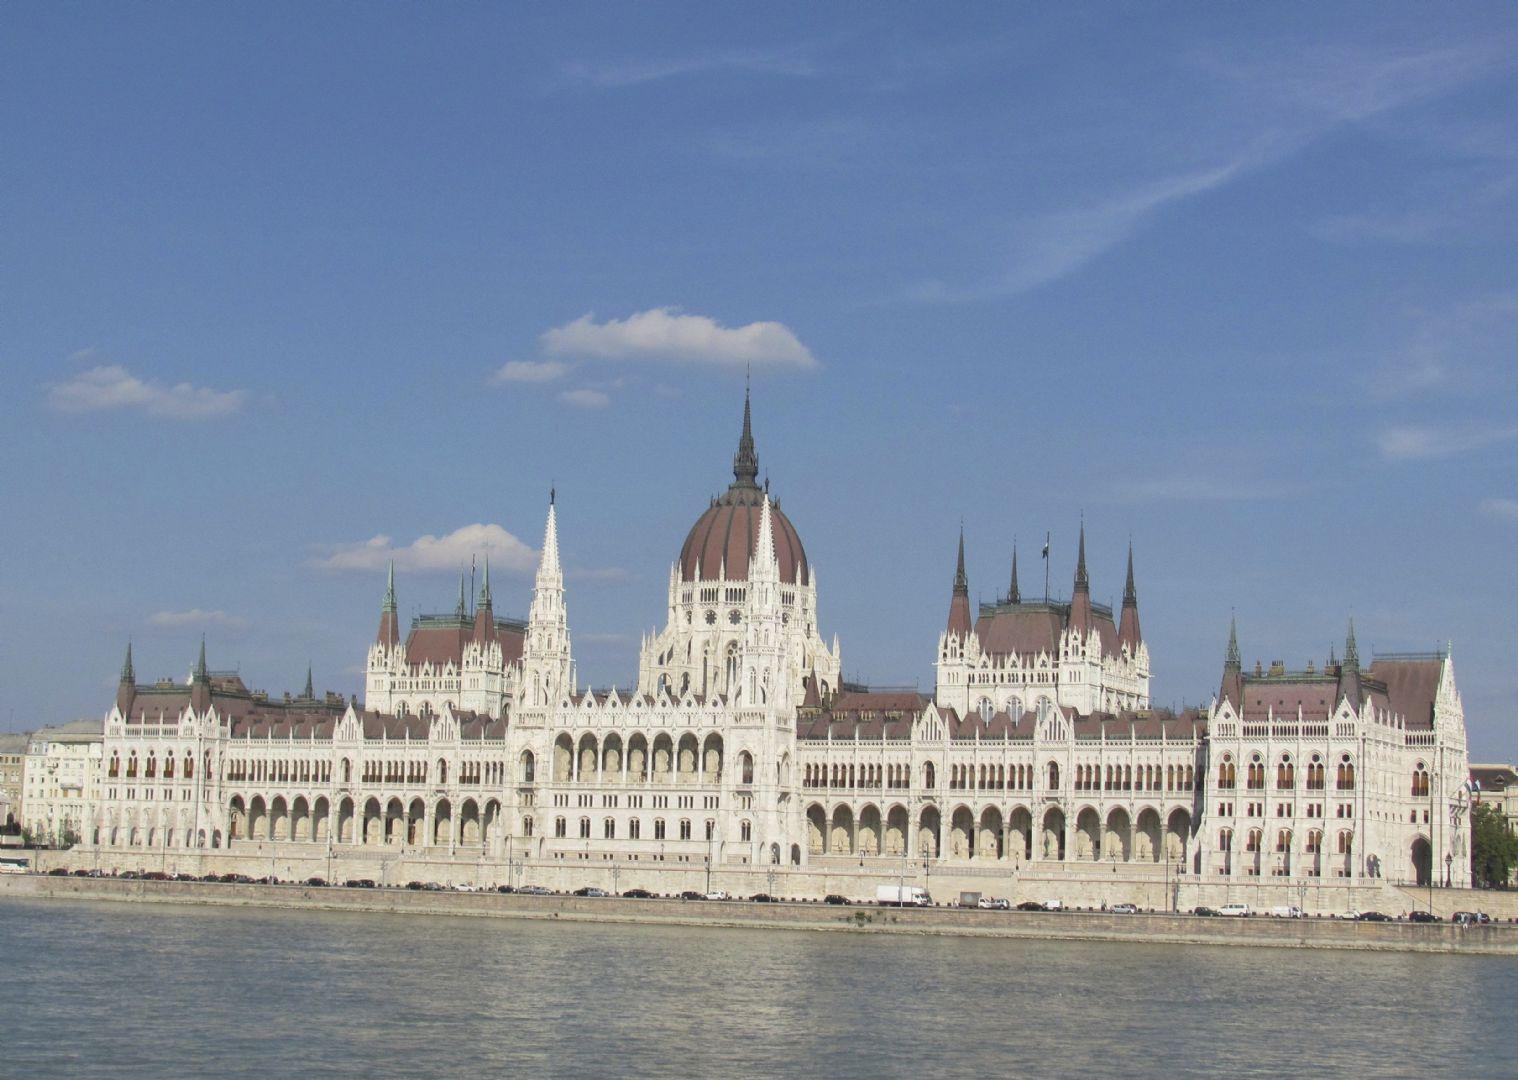 viennatobudapest6.jpg - Austria, Slovakia and Hungary - Vienna to Budapest - Self-Guided Family Cycling Holiday - Family Cycling